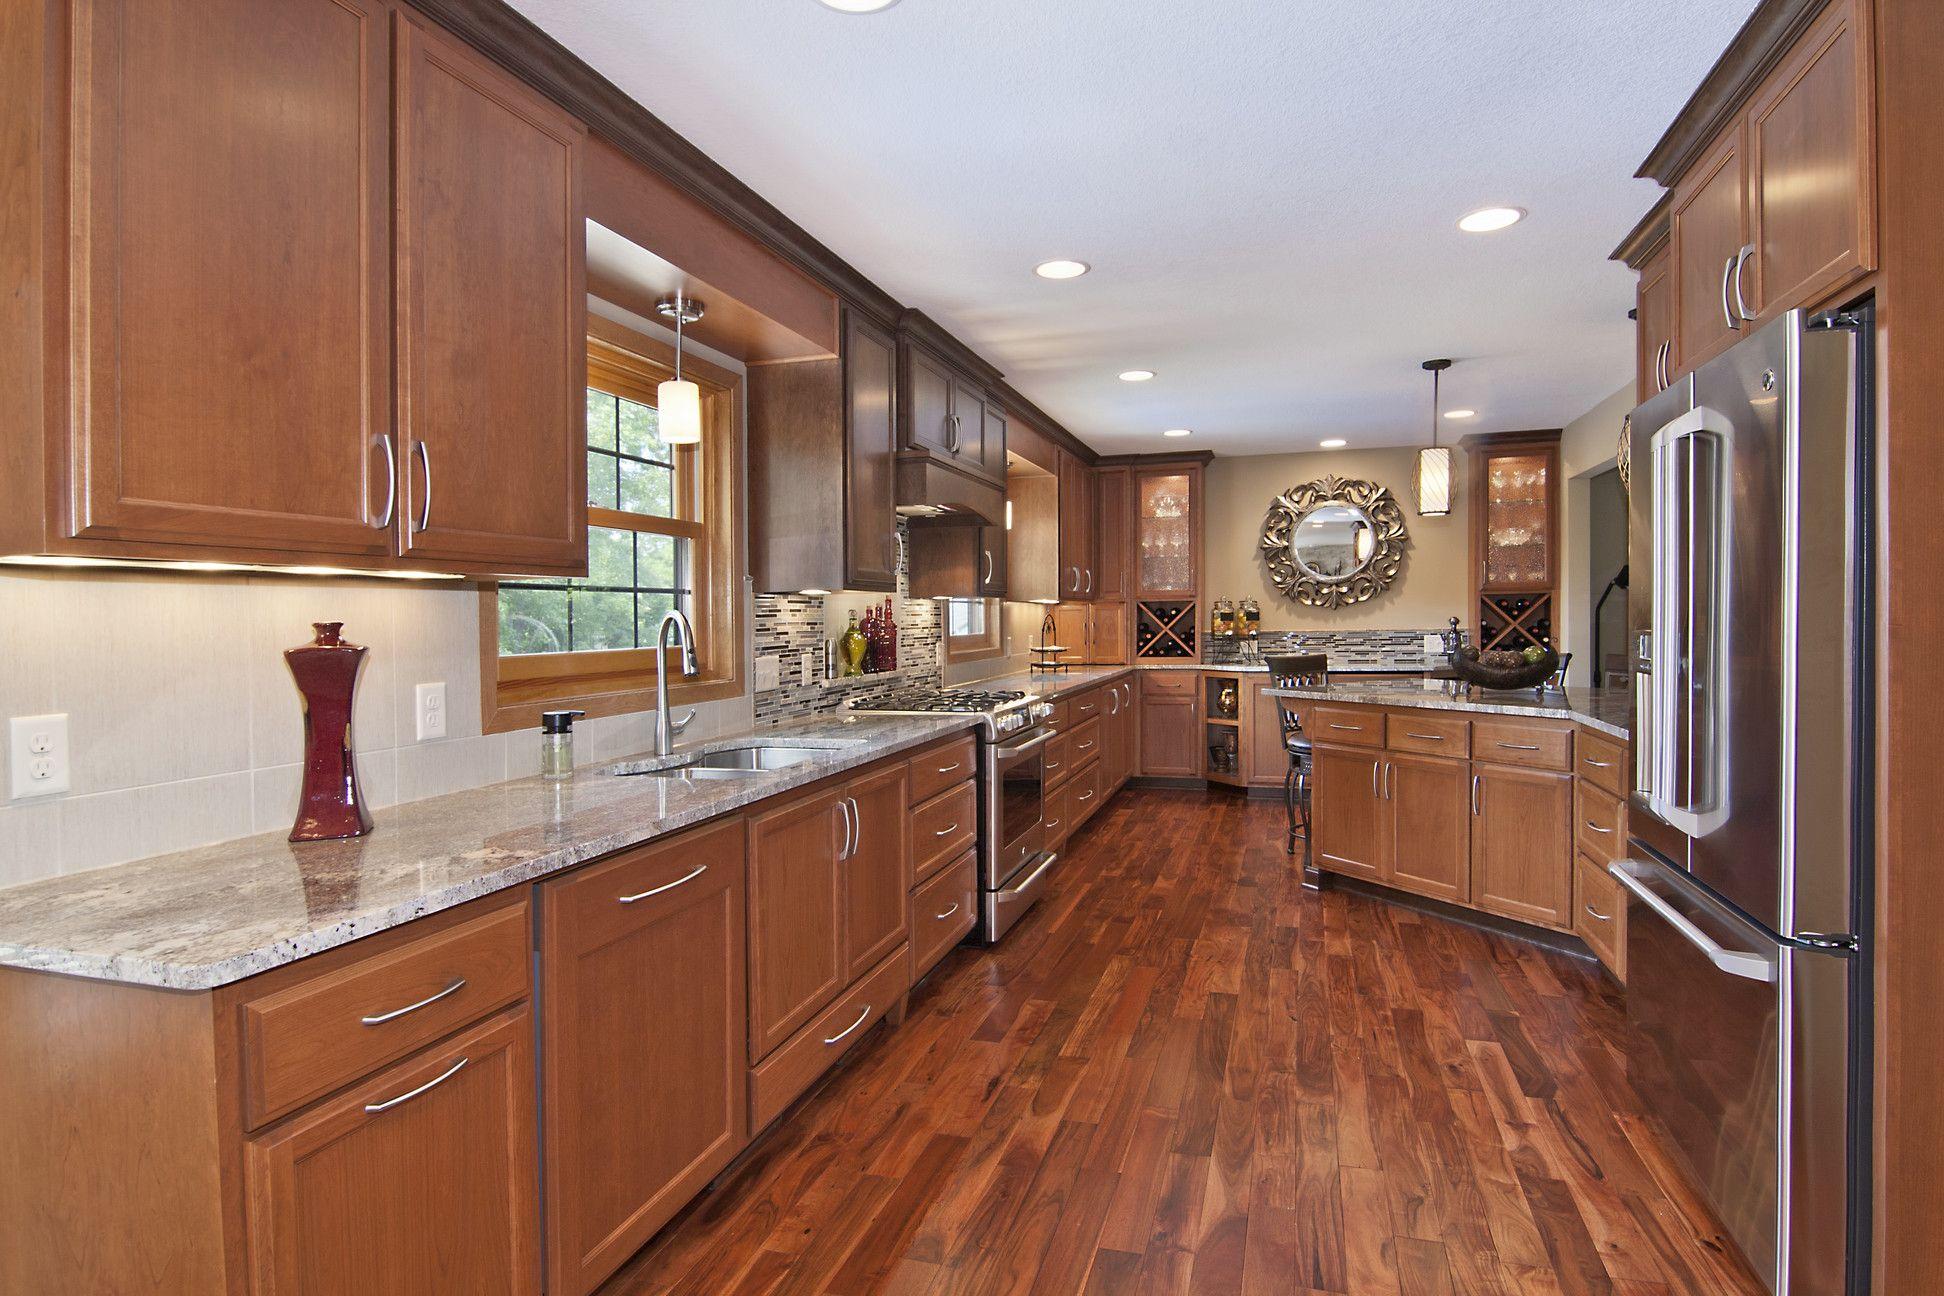 Acacia Sagebrush Plank Tuscan Kitchen Hardwood In Kitchen Wood Kitchen